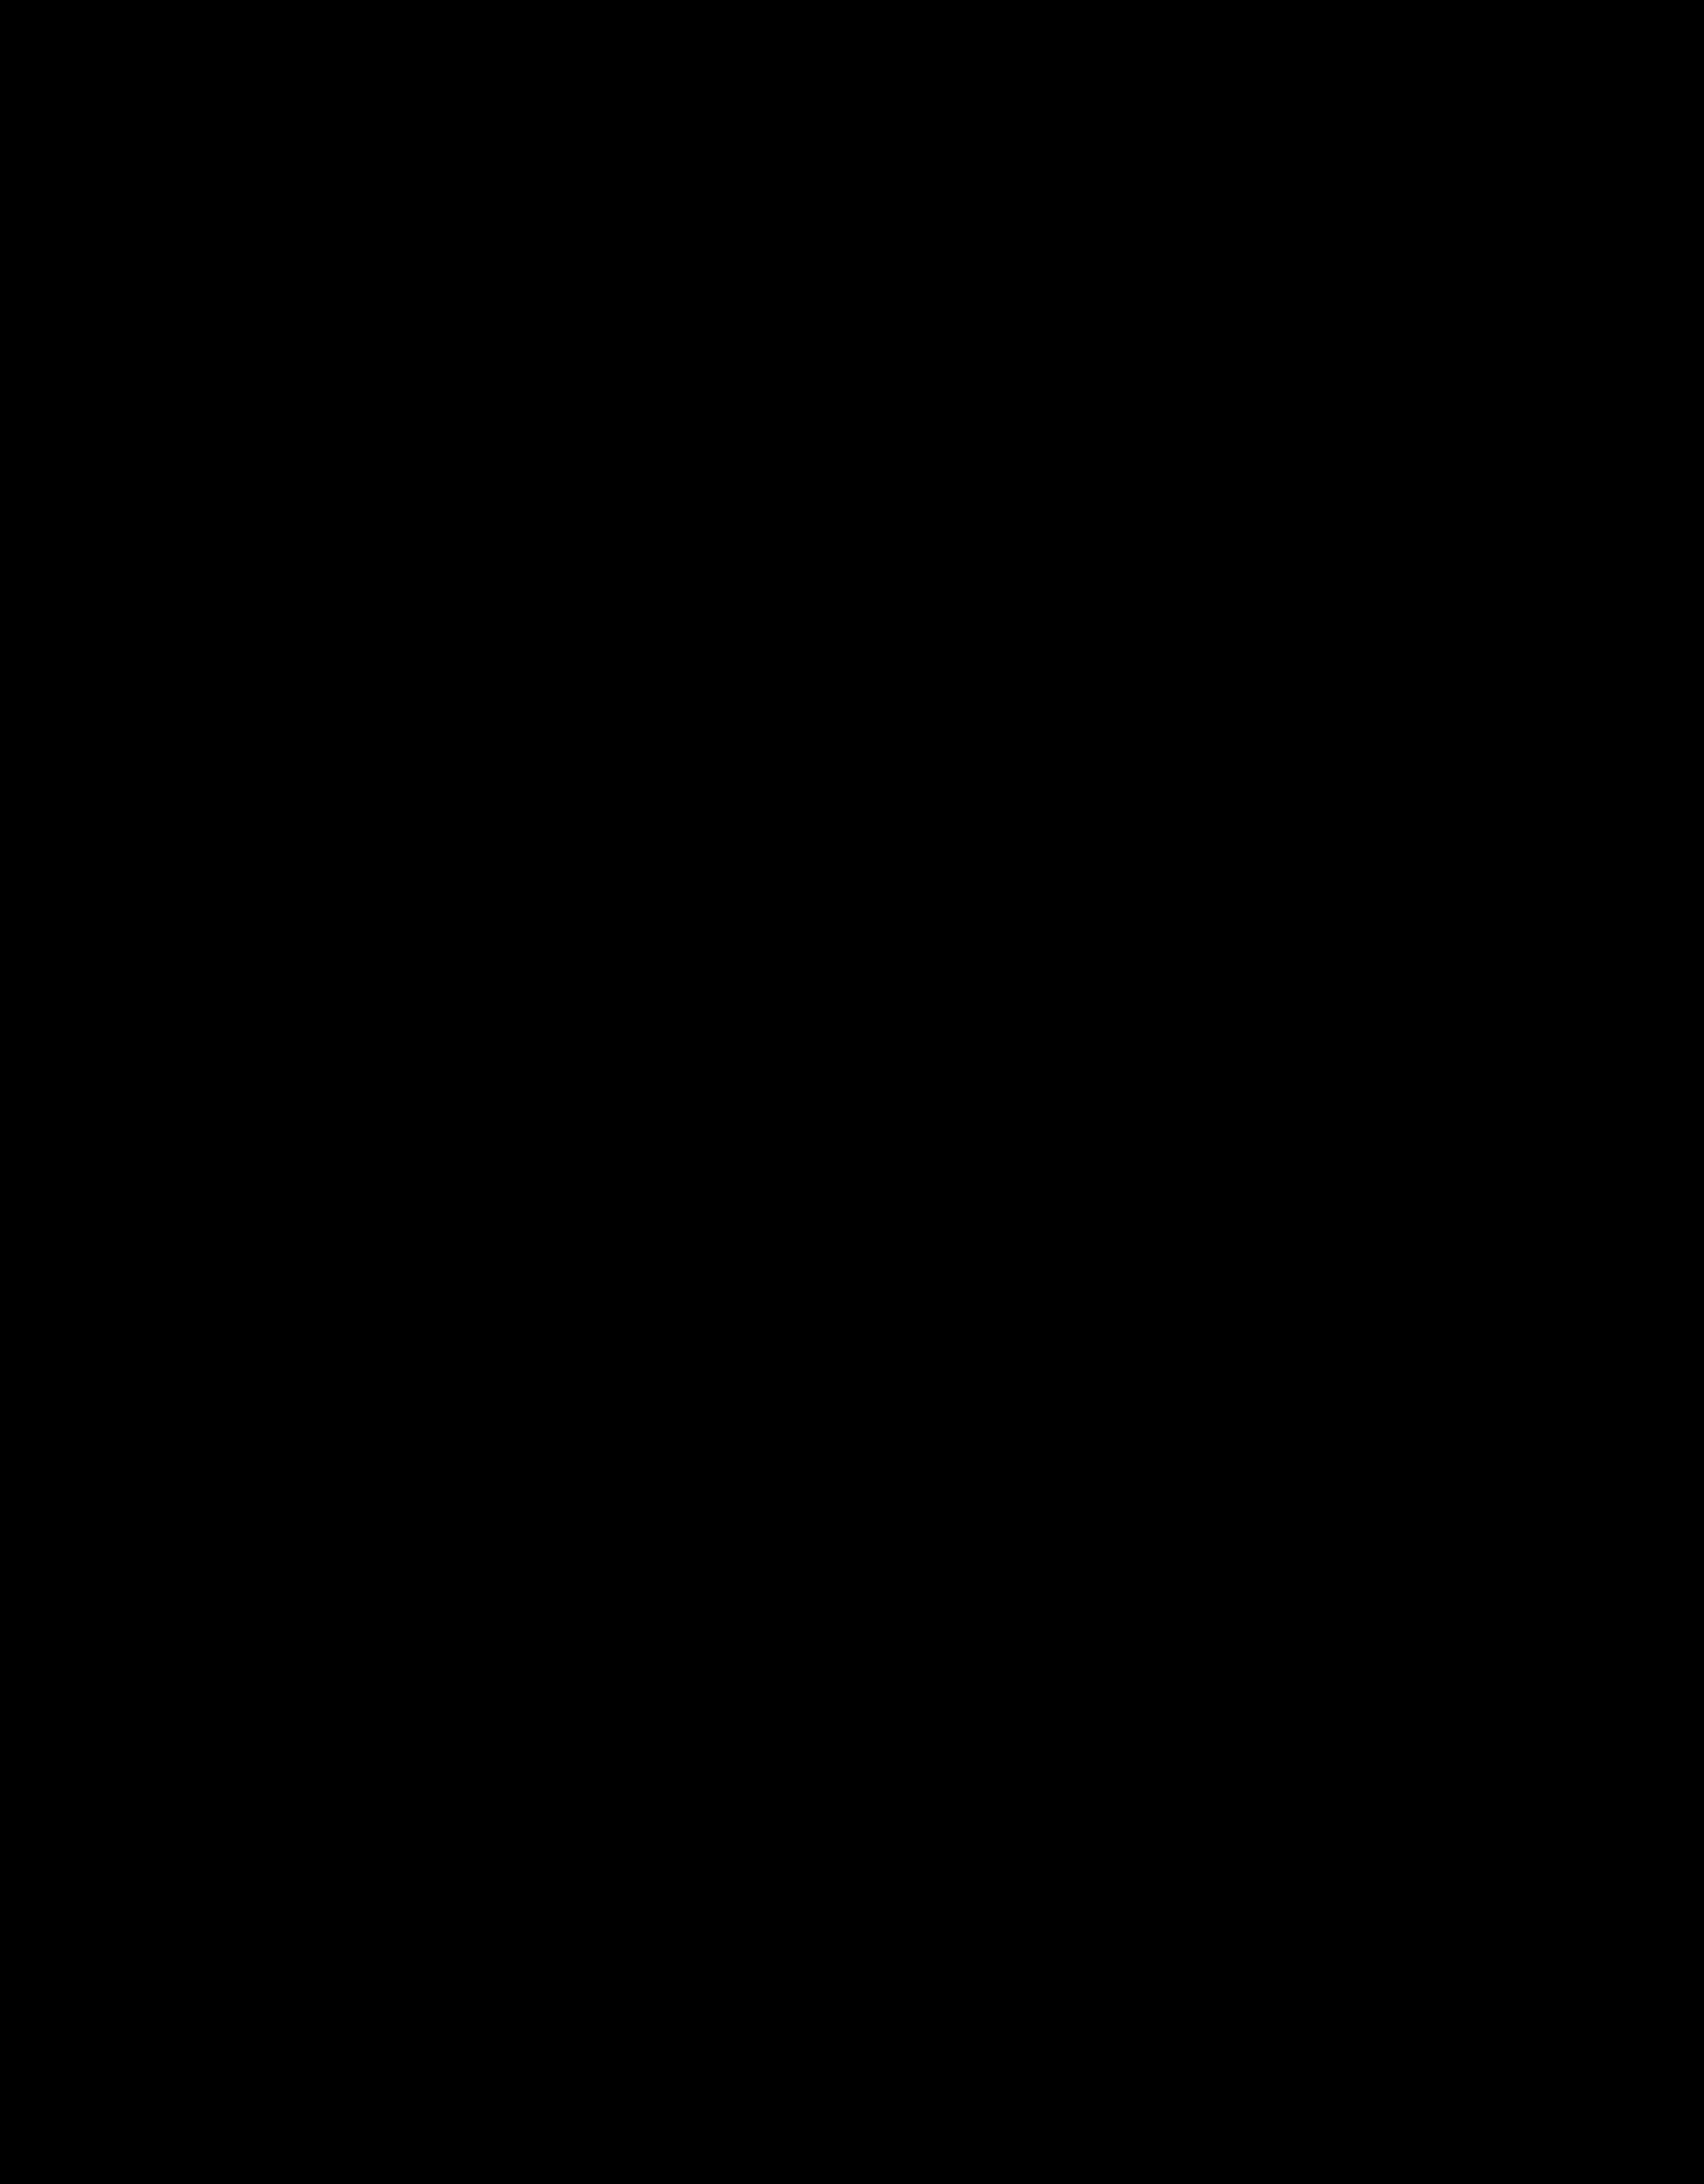 Hand pointer clipart banner transparent Clipart - Hand Pointer Cursor Vectorized banner transparent